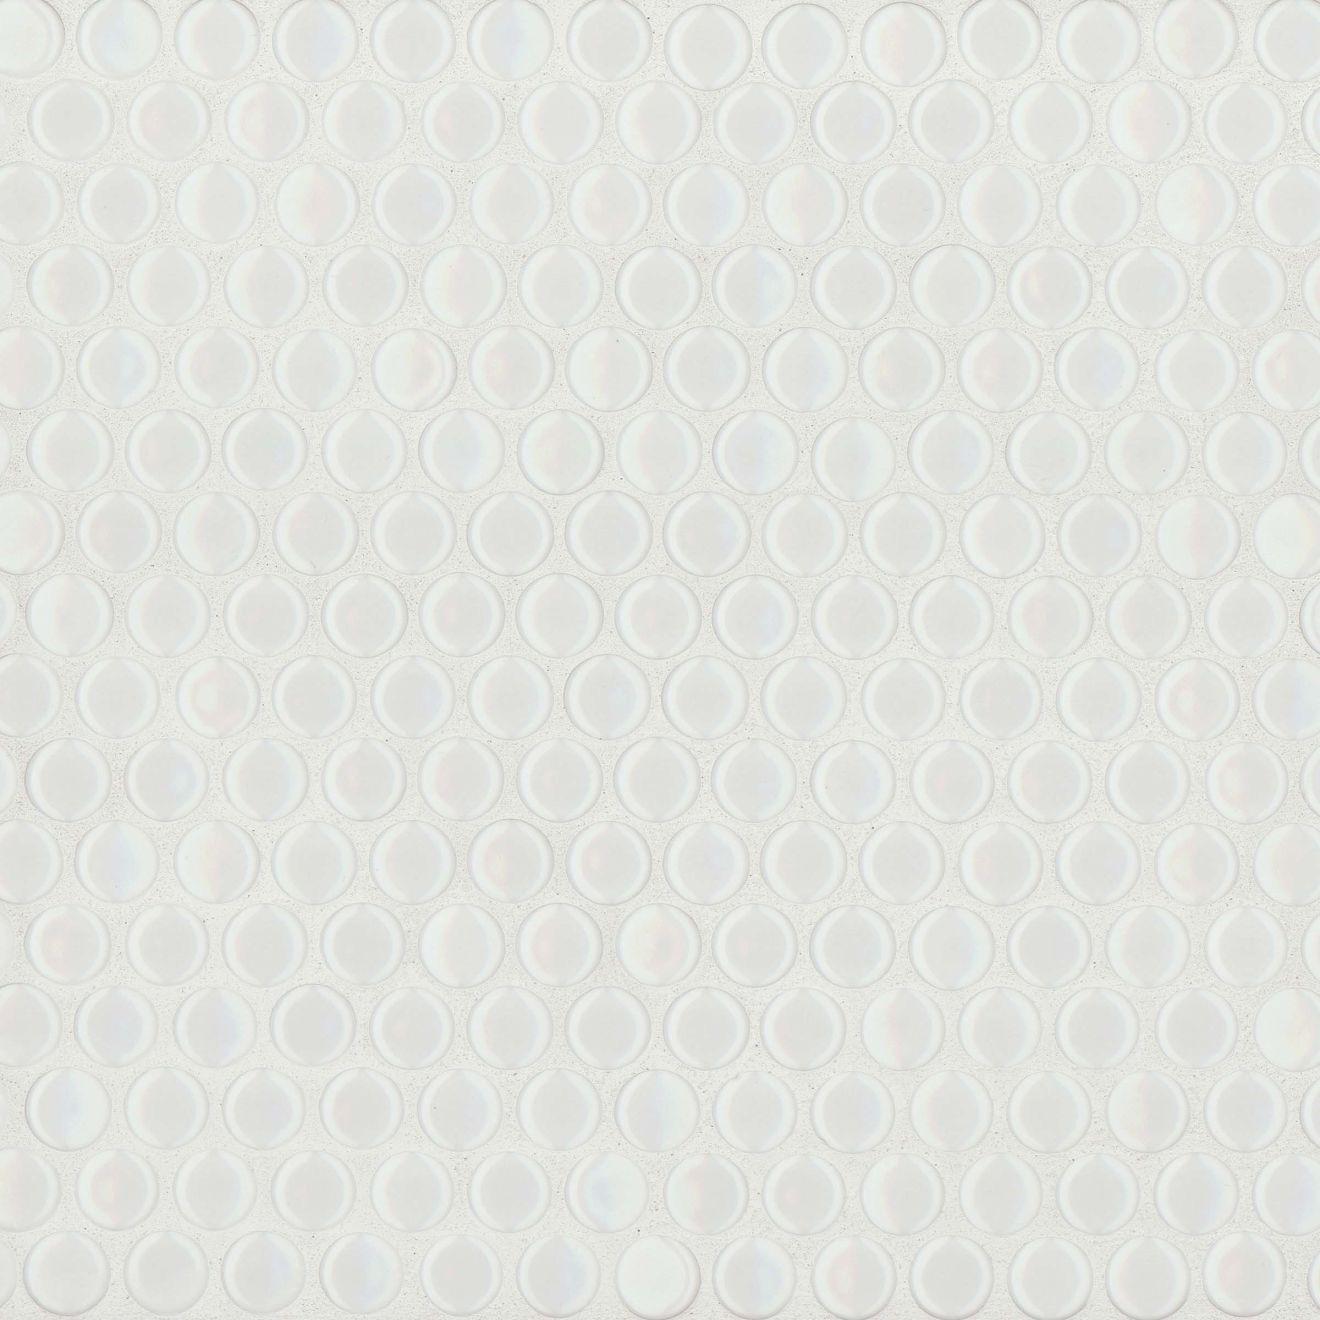 "360 3/4"" x 3/4"" Floor & Wall Mosaic in White Gloss"